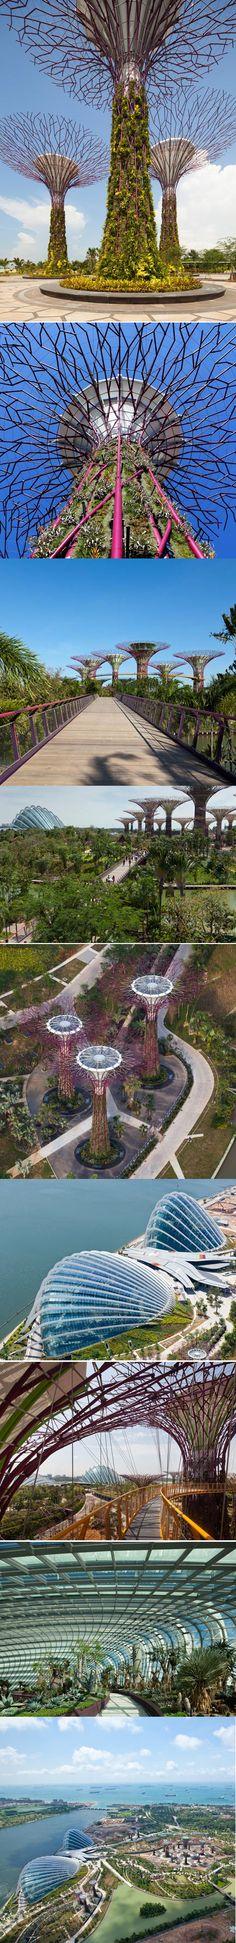 Preview of Garden @ the Bay, Singapore